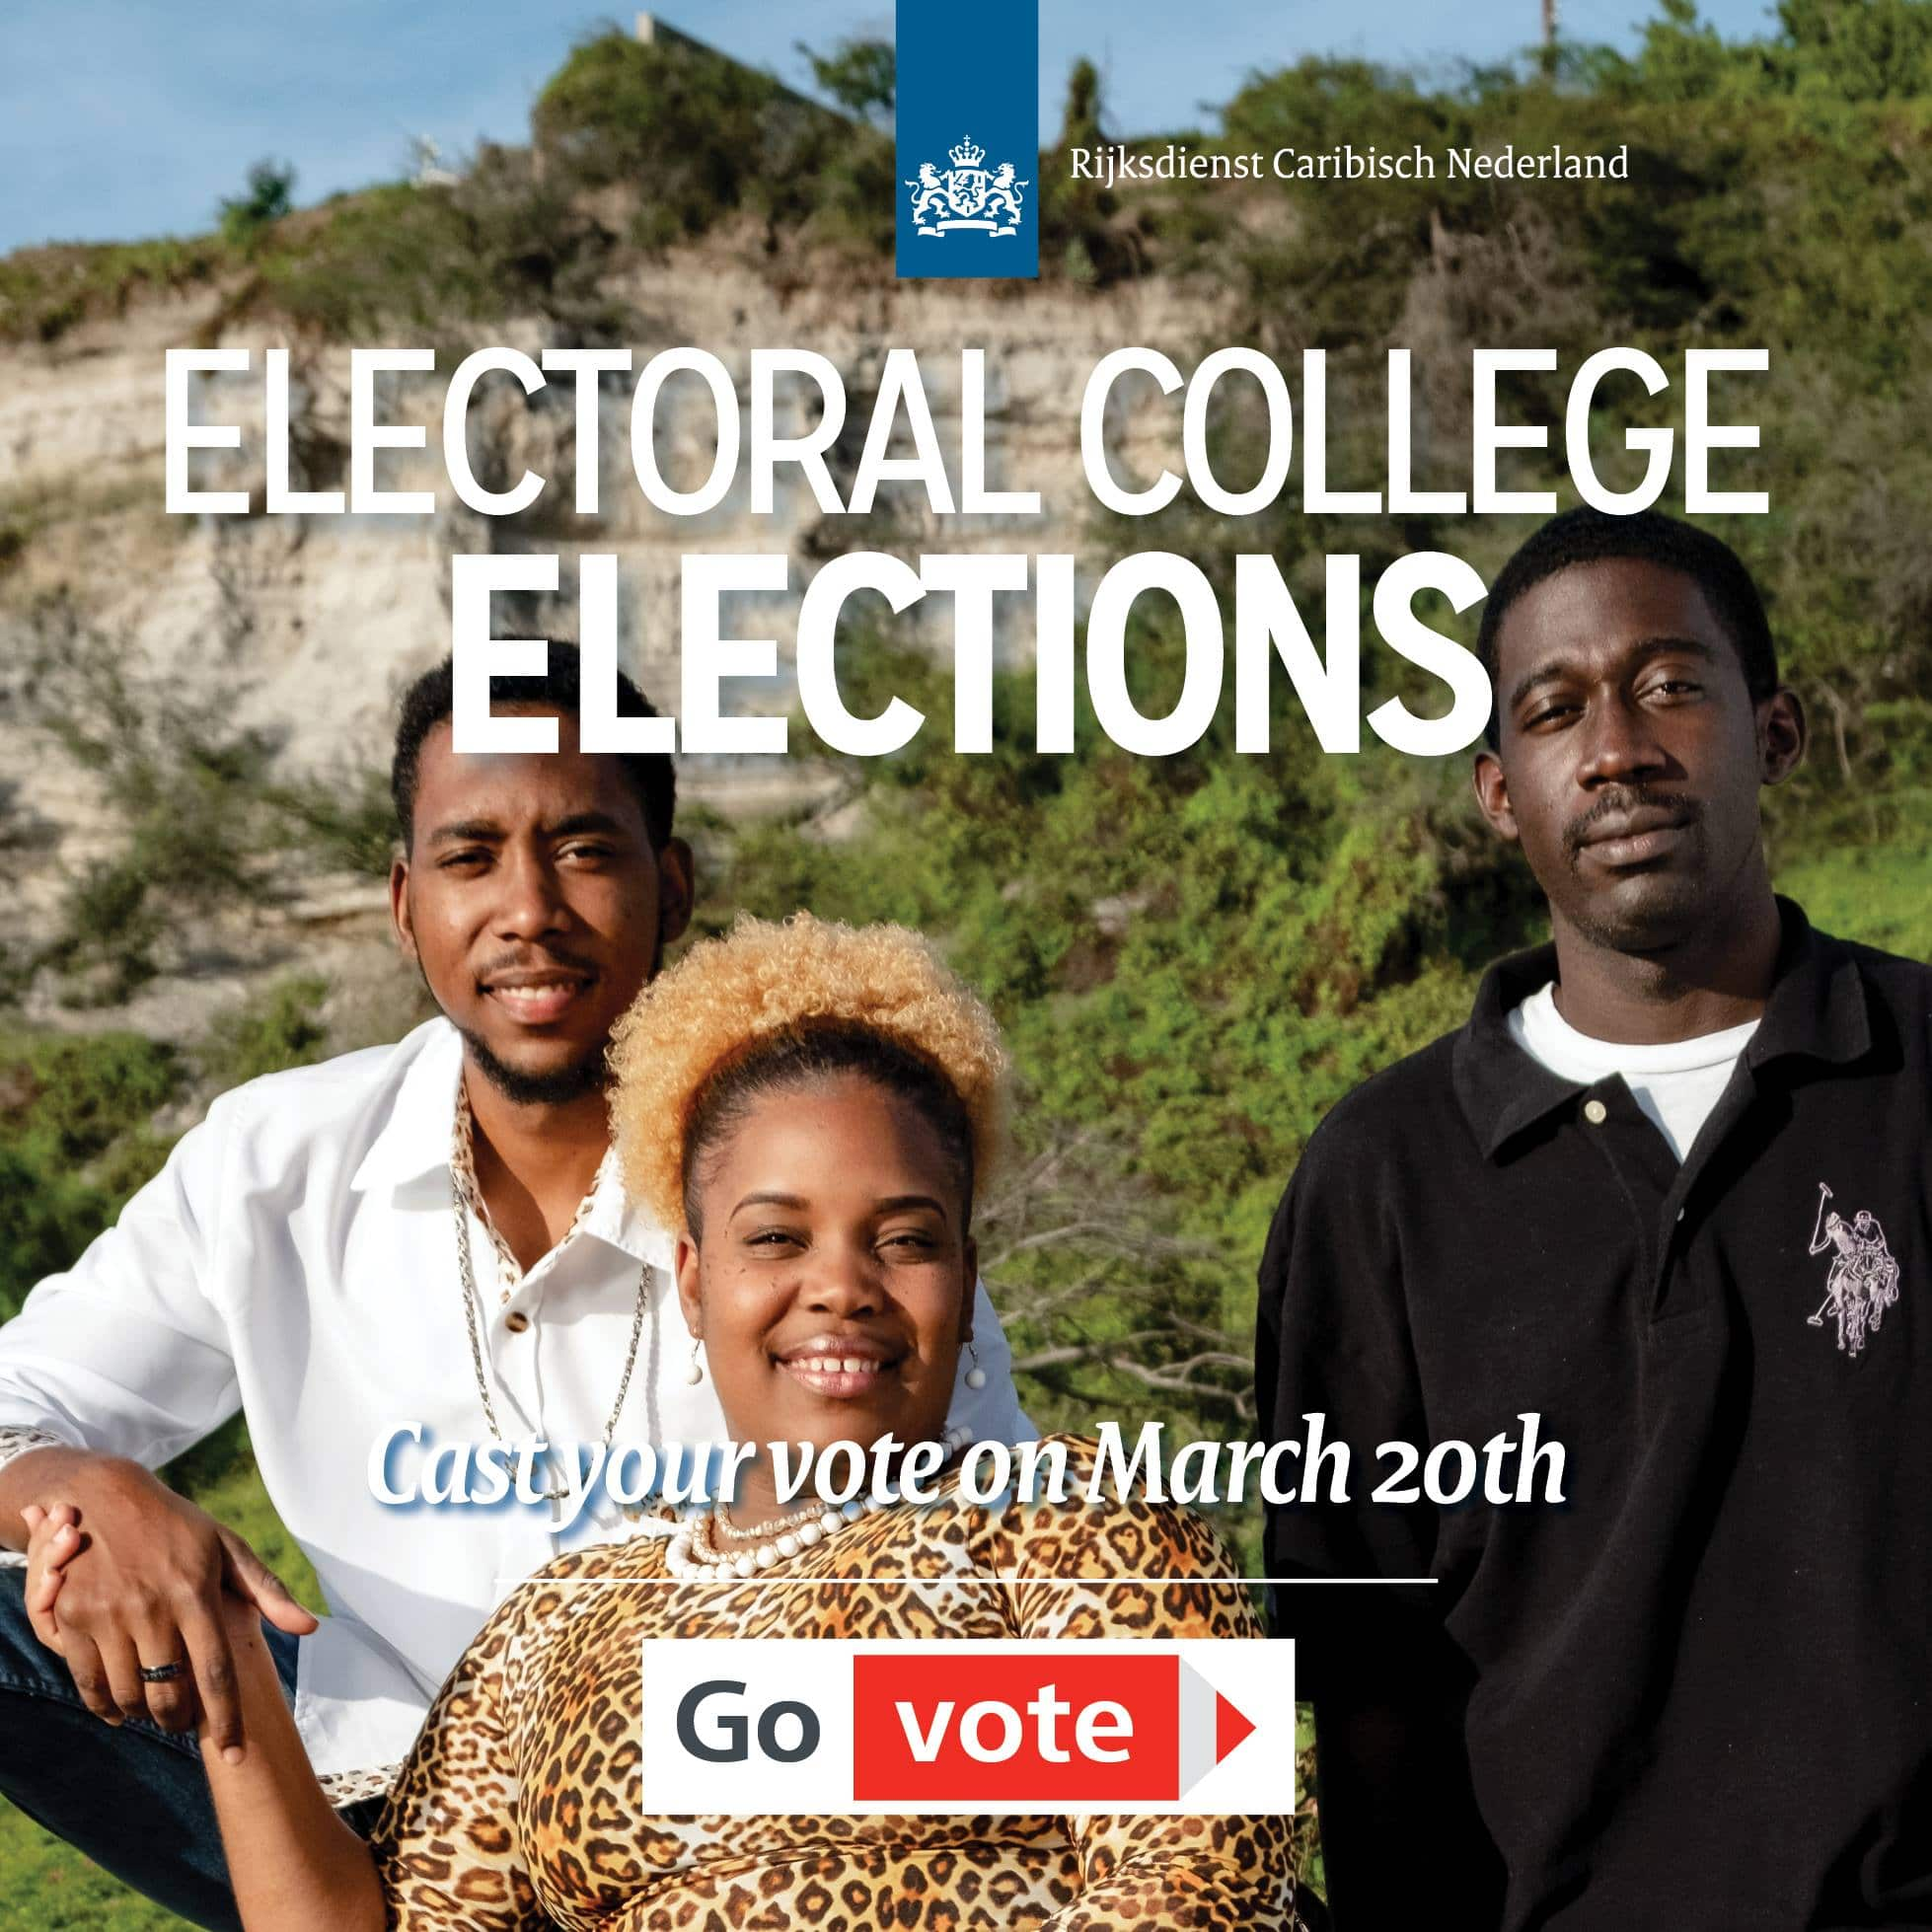 Electoral college elections